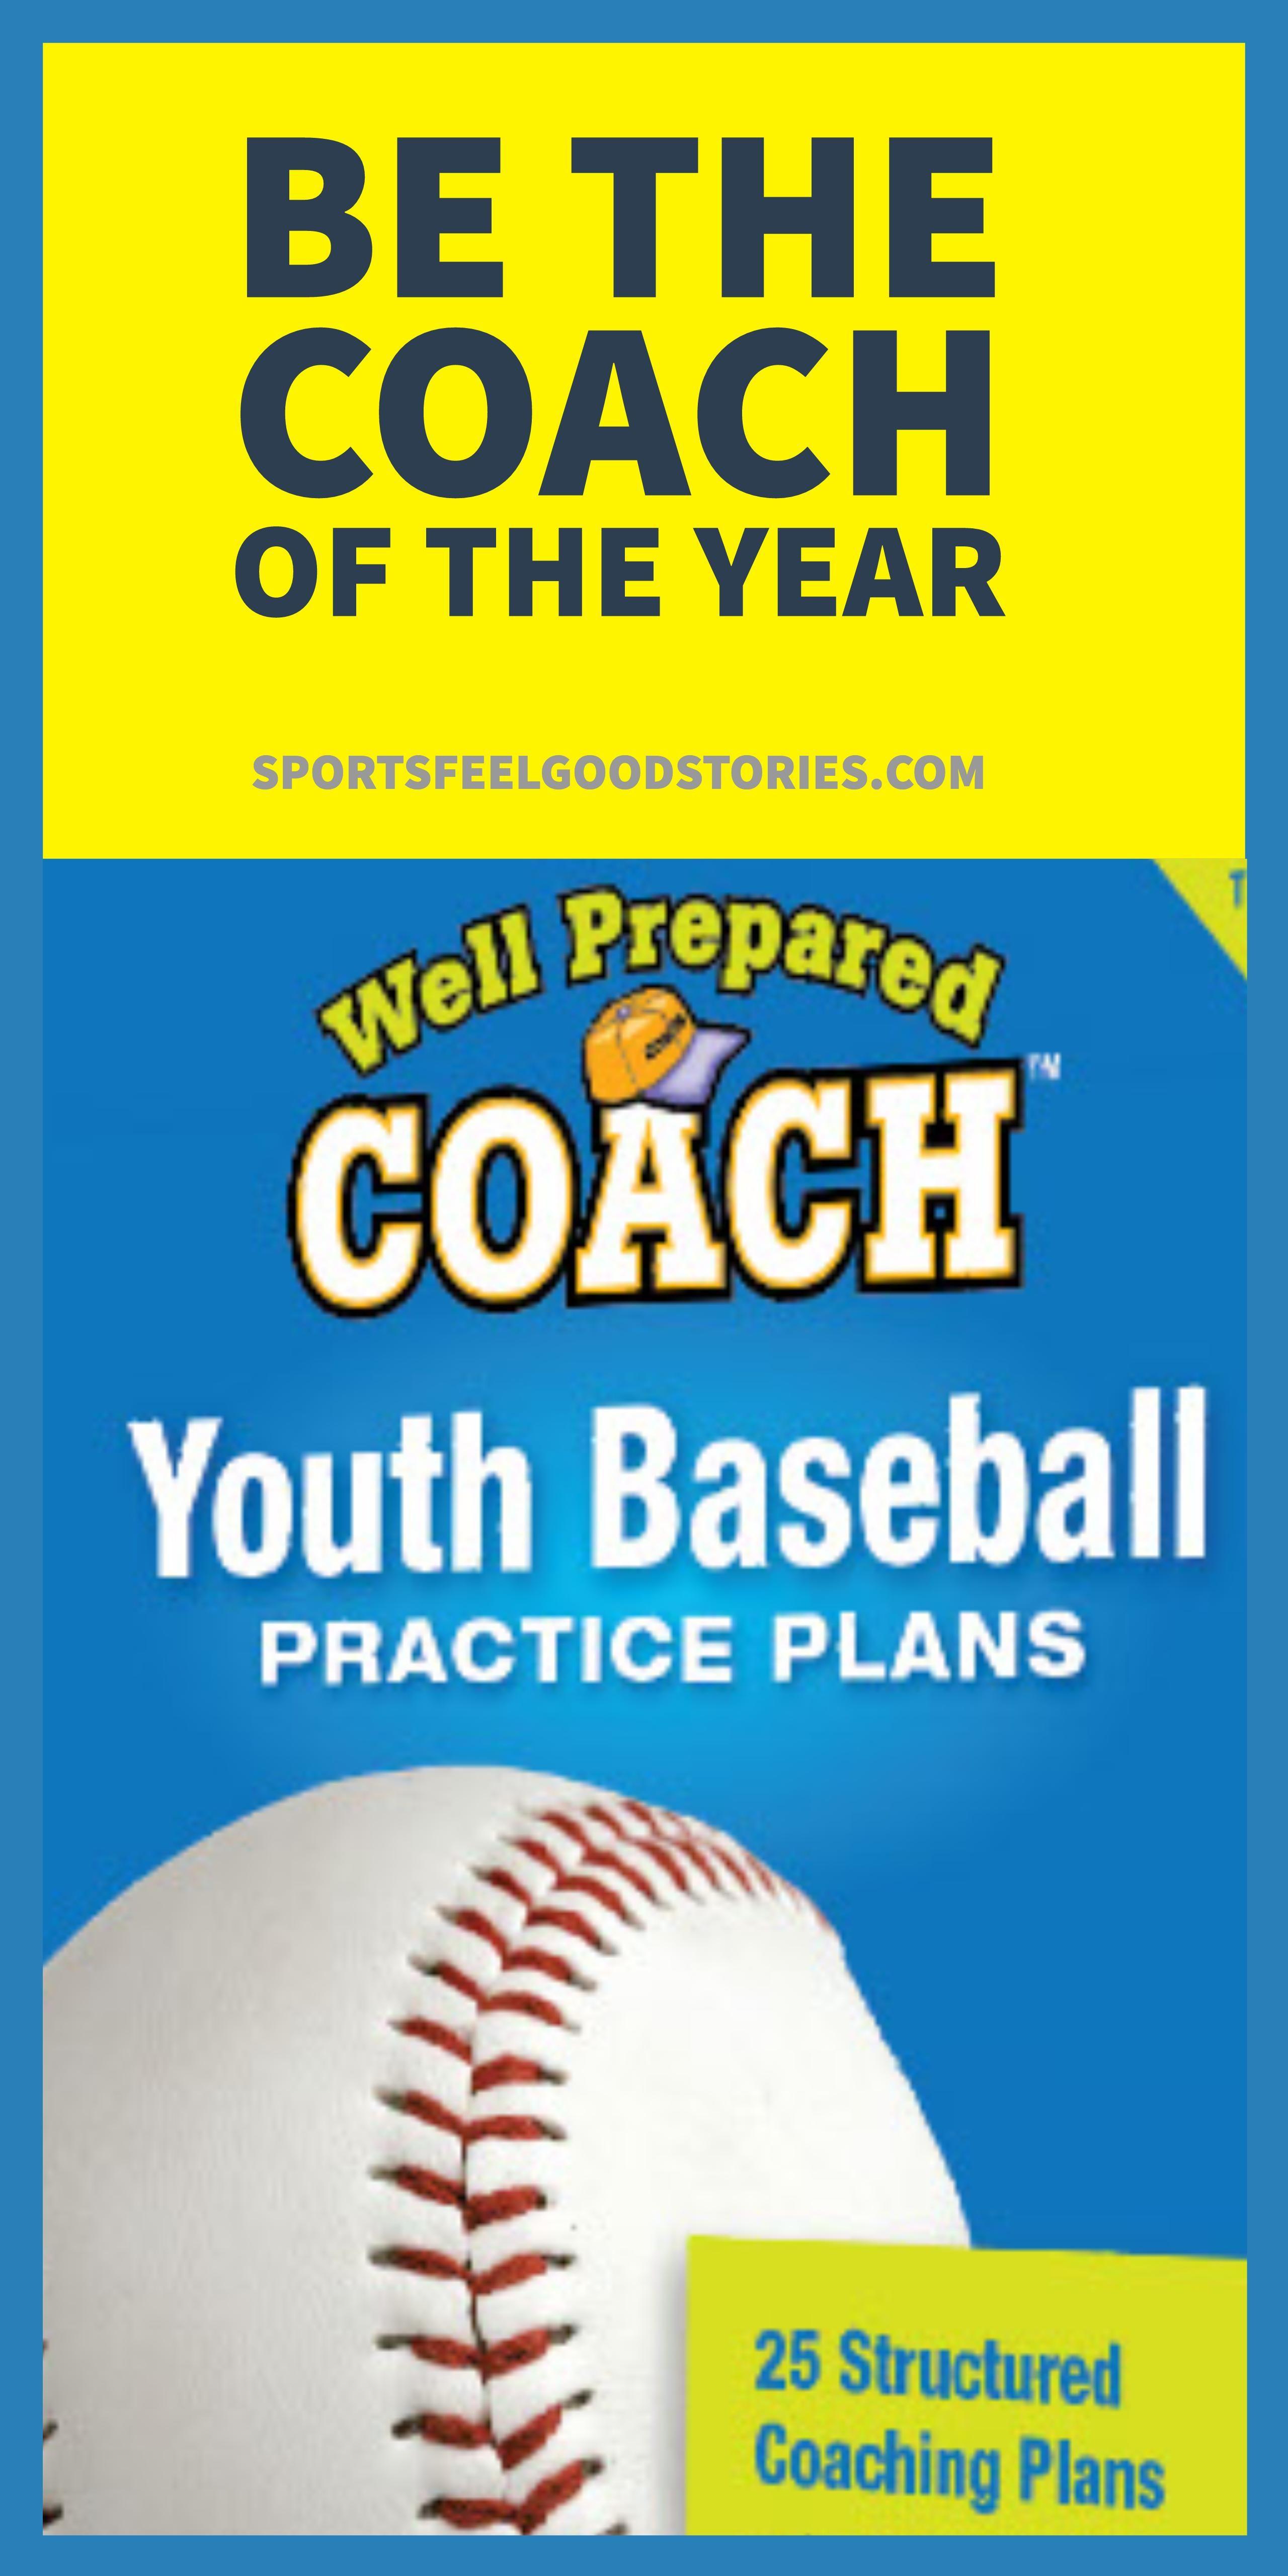 Baseball Practice Plans Coaching Youth Hitting Drills